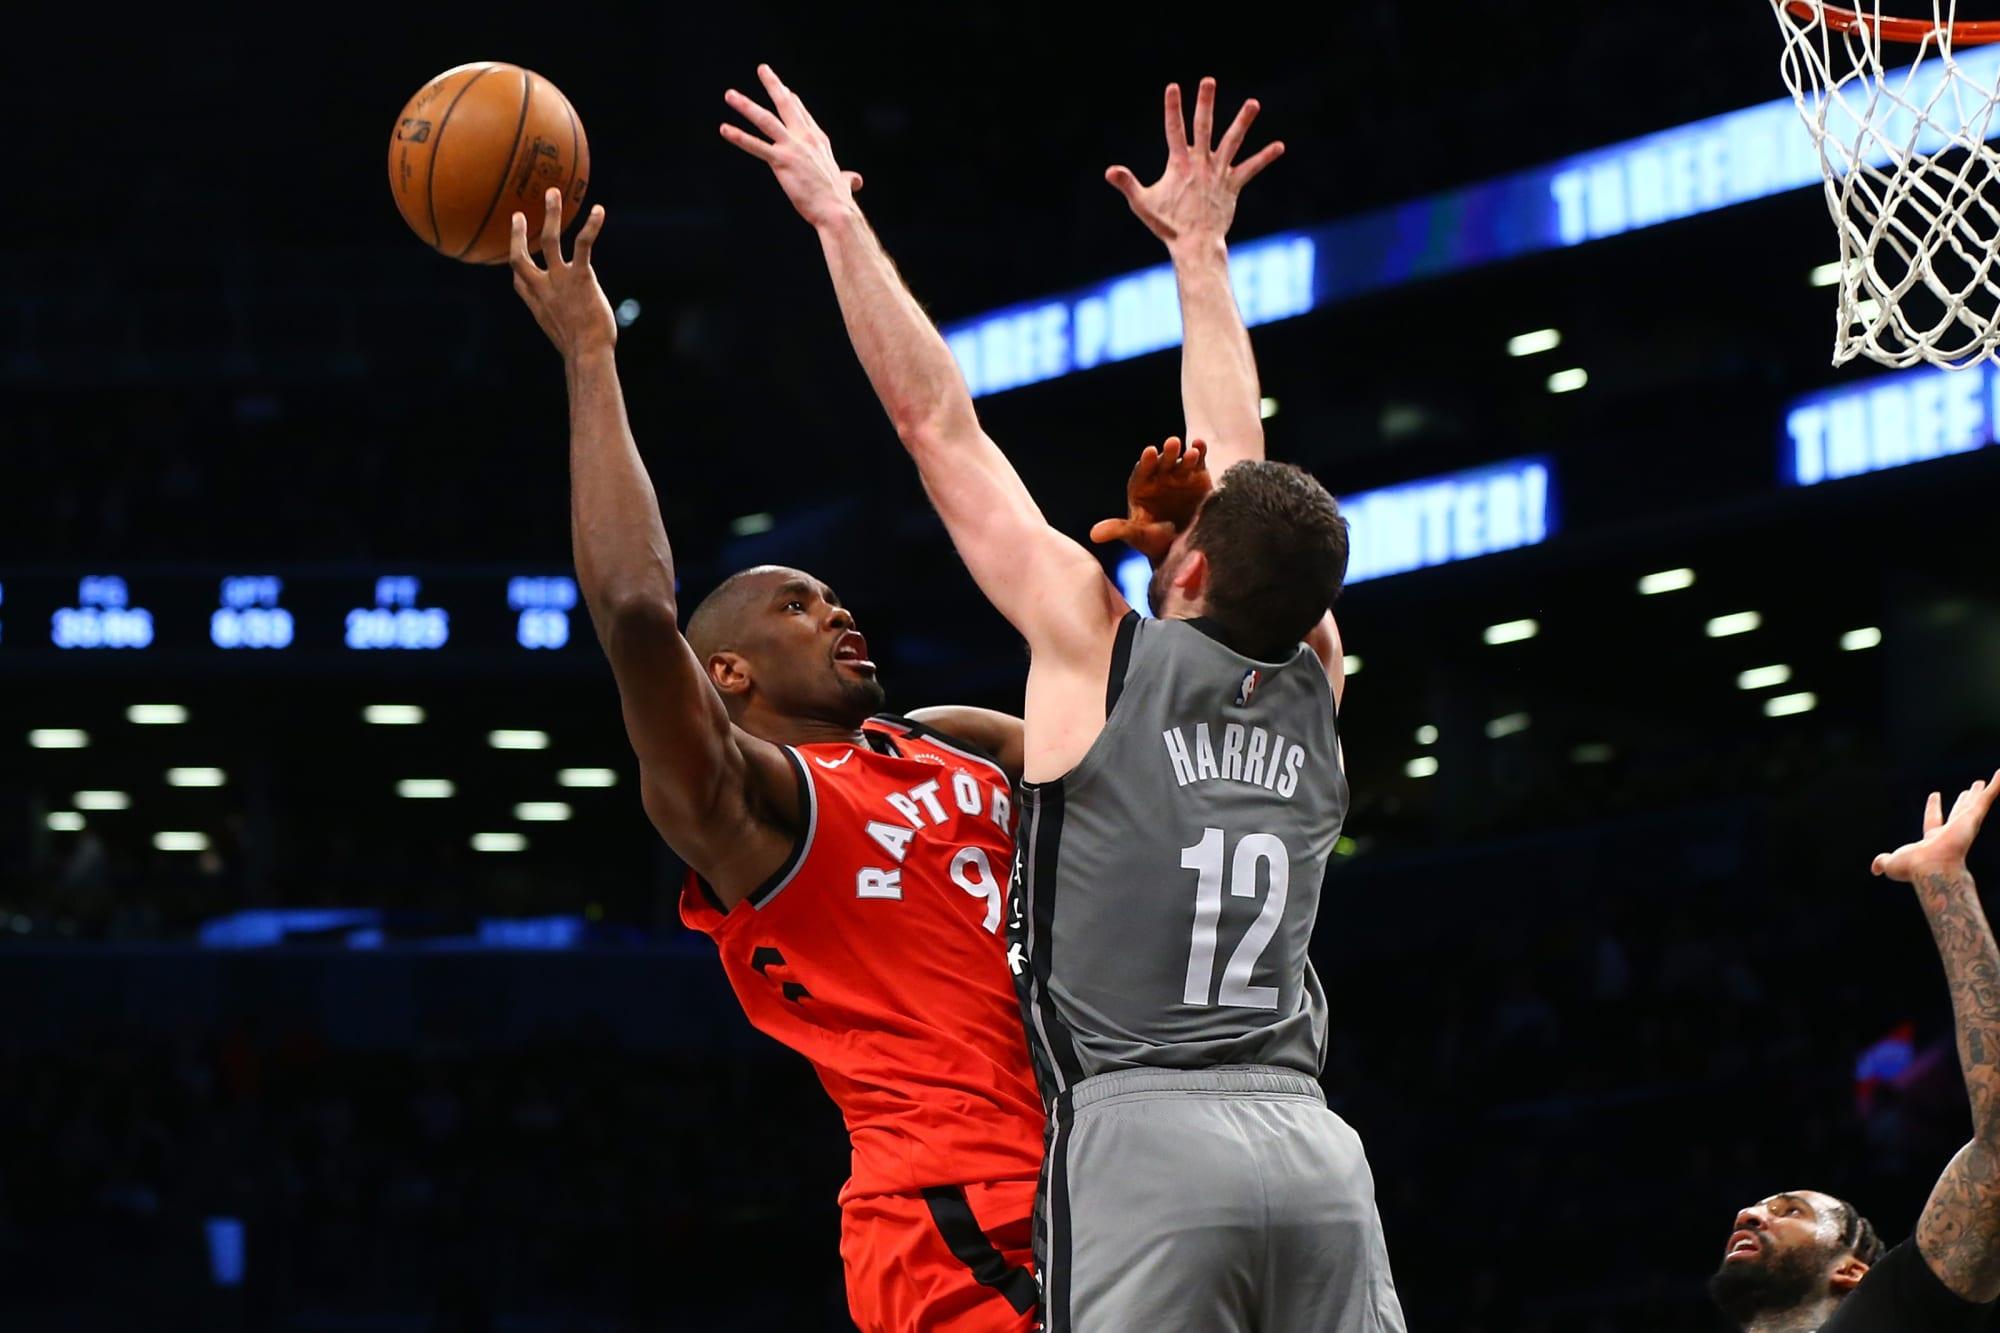 Toronto Raptors: Free agency rumors surrounding Serge Ibaka